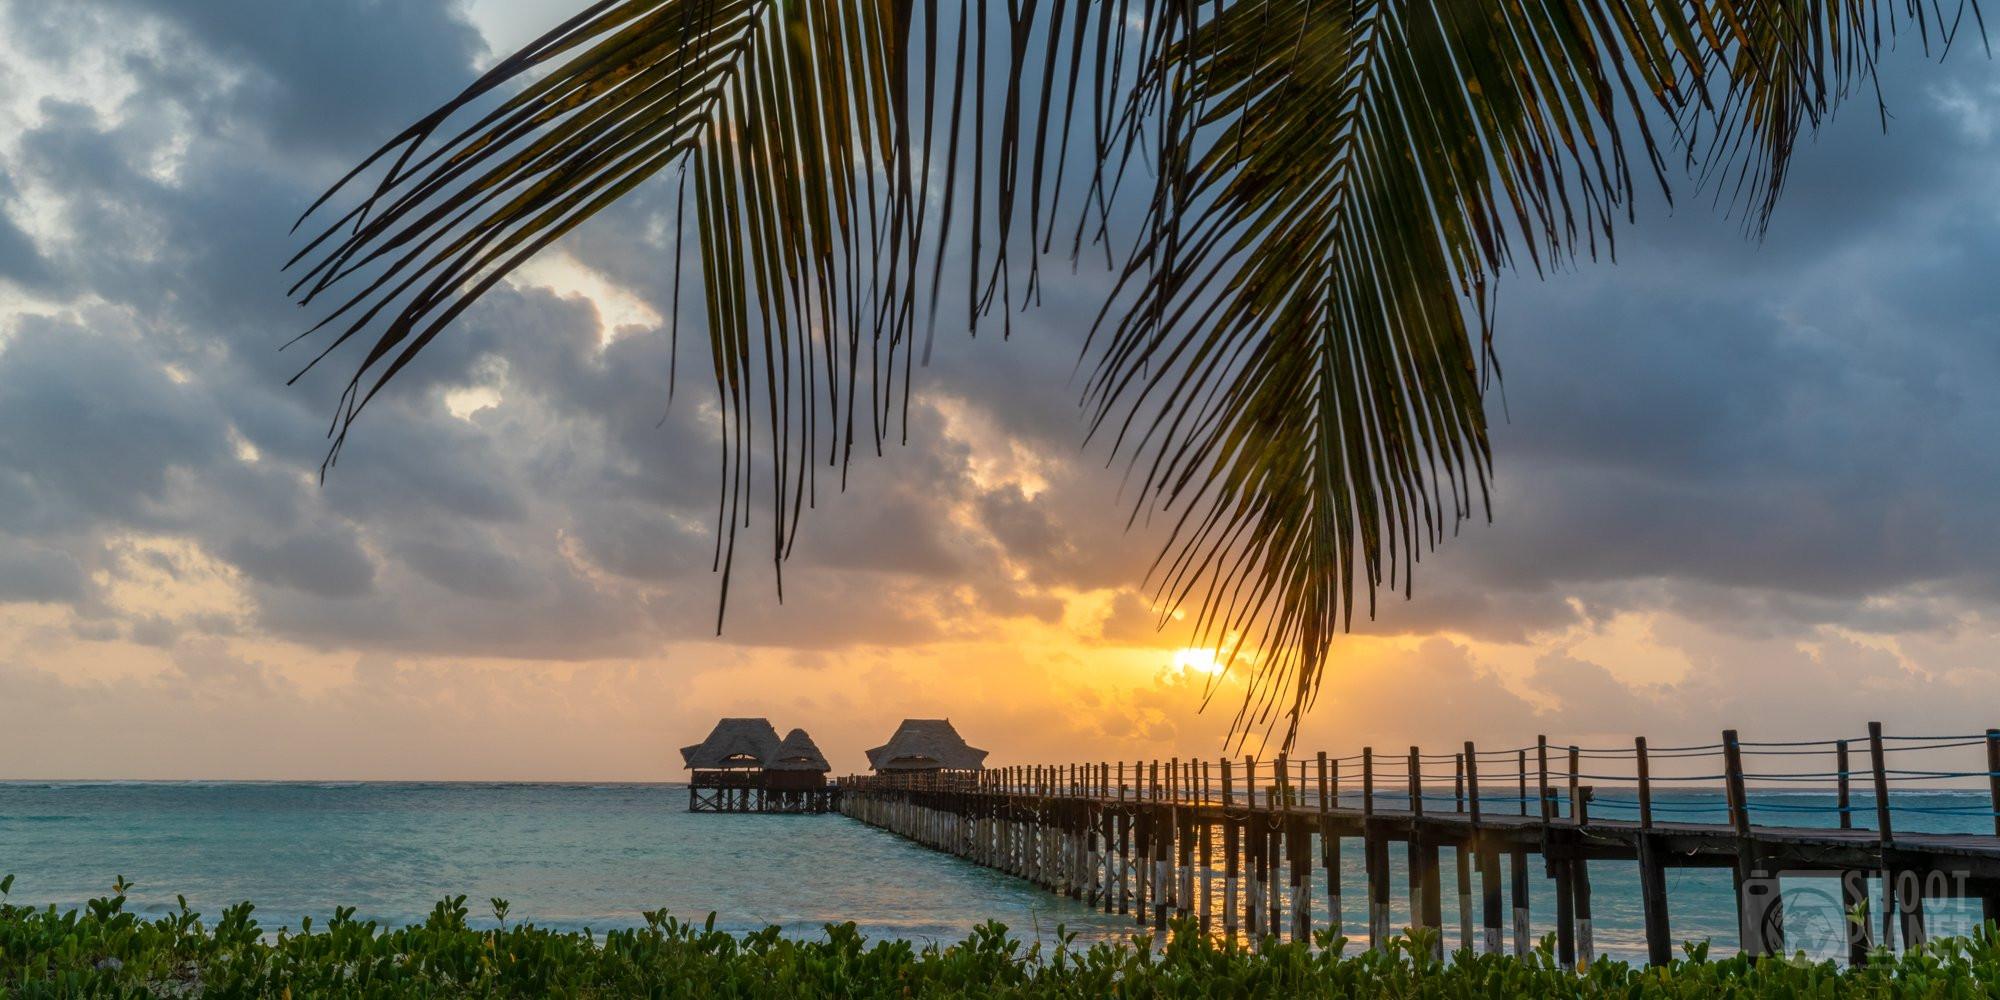 Dongwe beach and Pier sunrise Zanzibar Tanzania